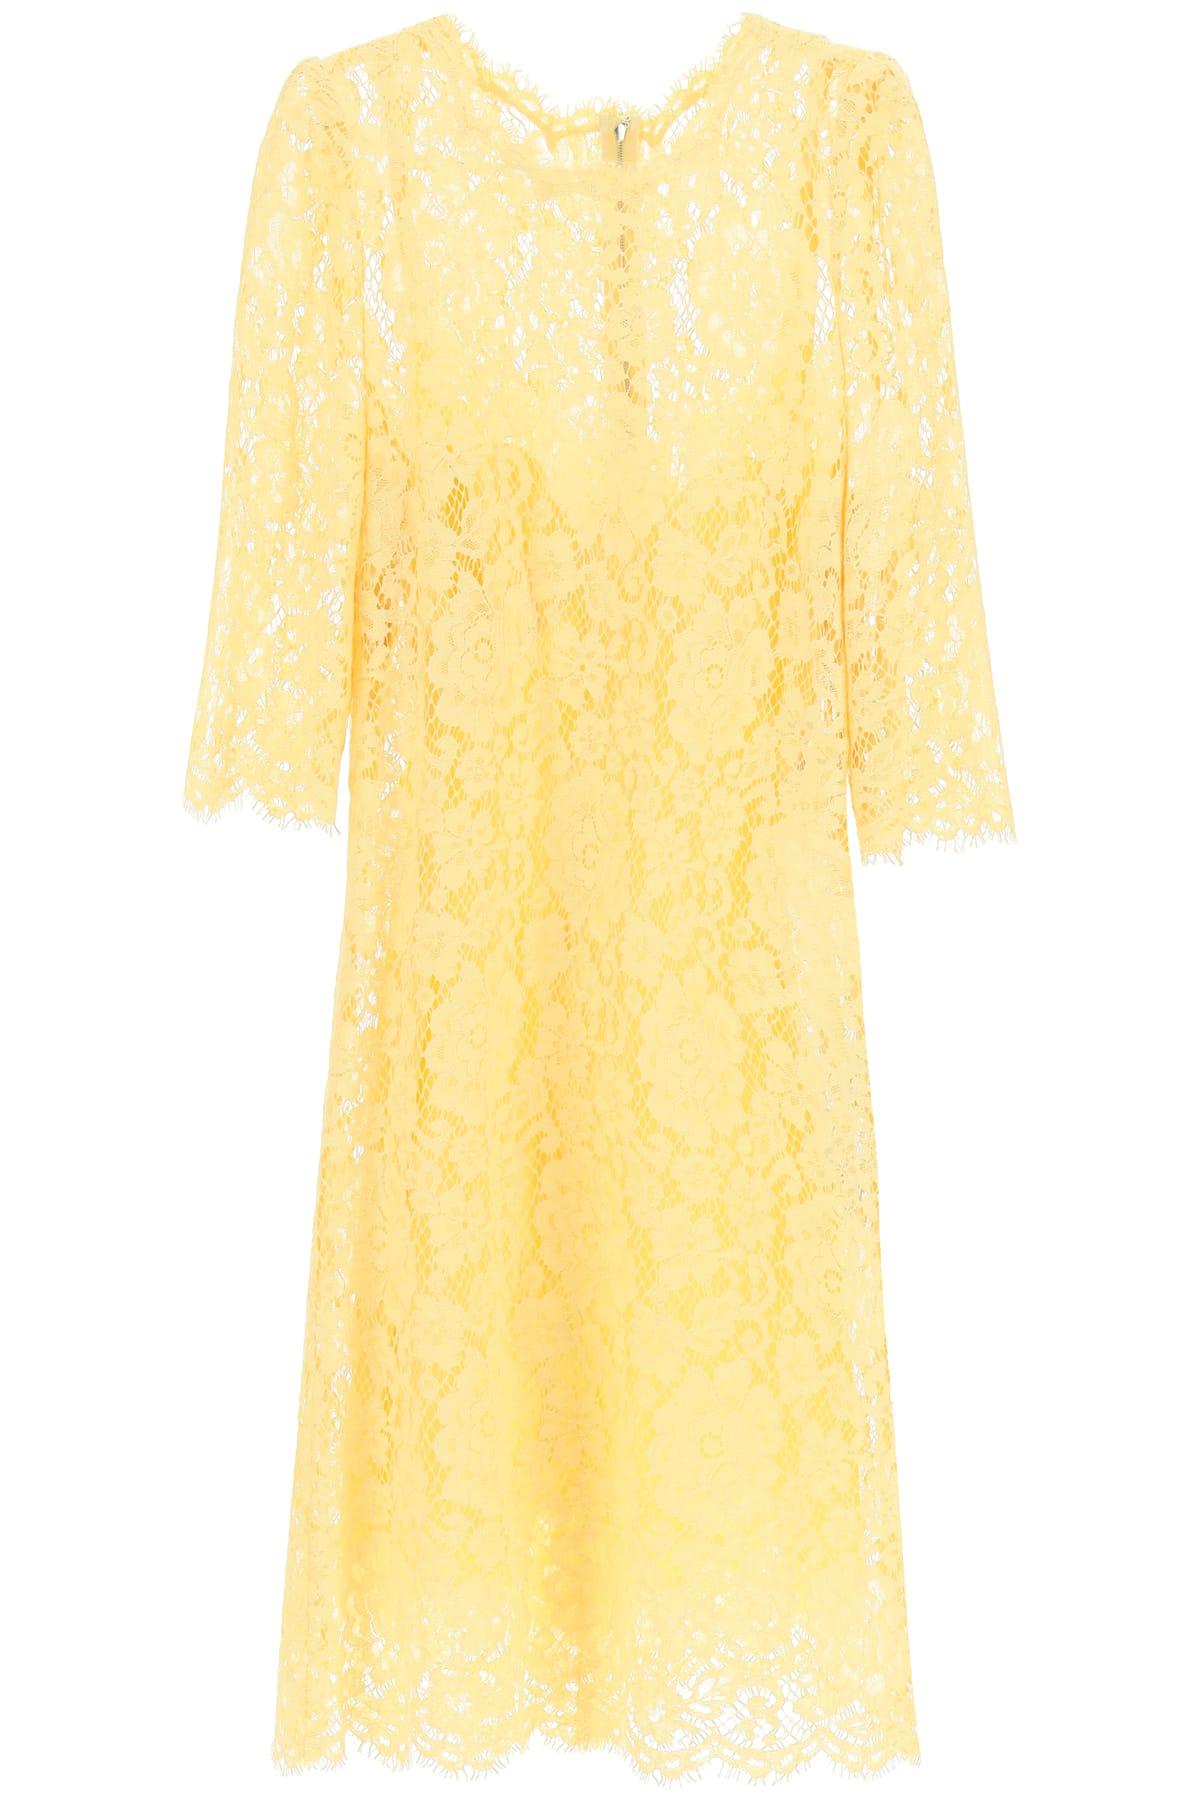 Buy Dolce & Gabbana Cordonetto Lace Mini Dress online, shop Dolce & Gabbana with free shipping